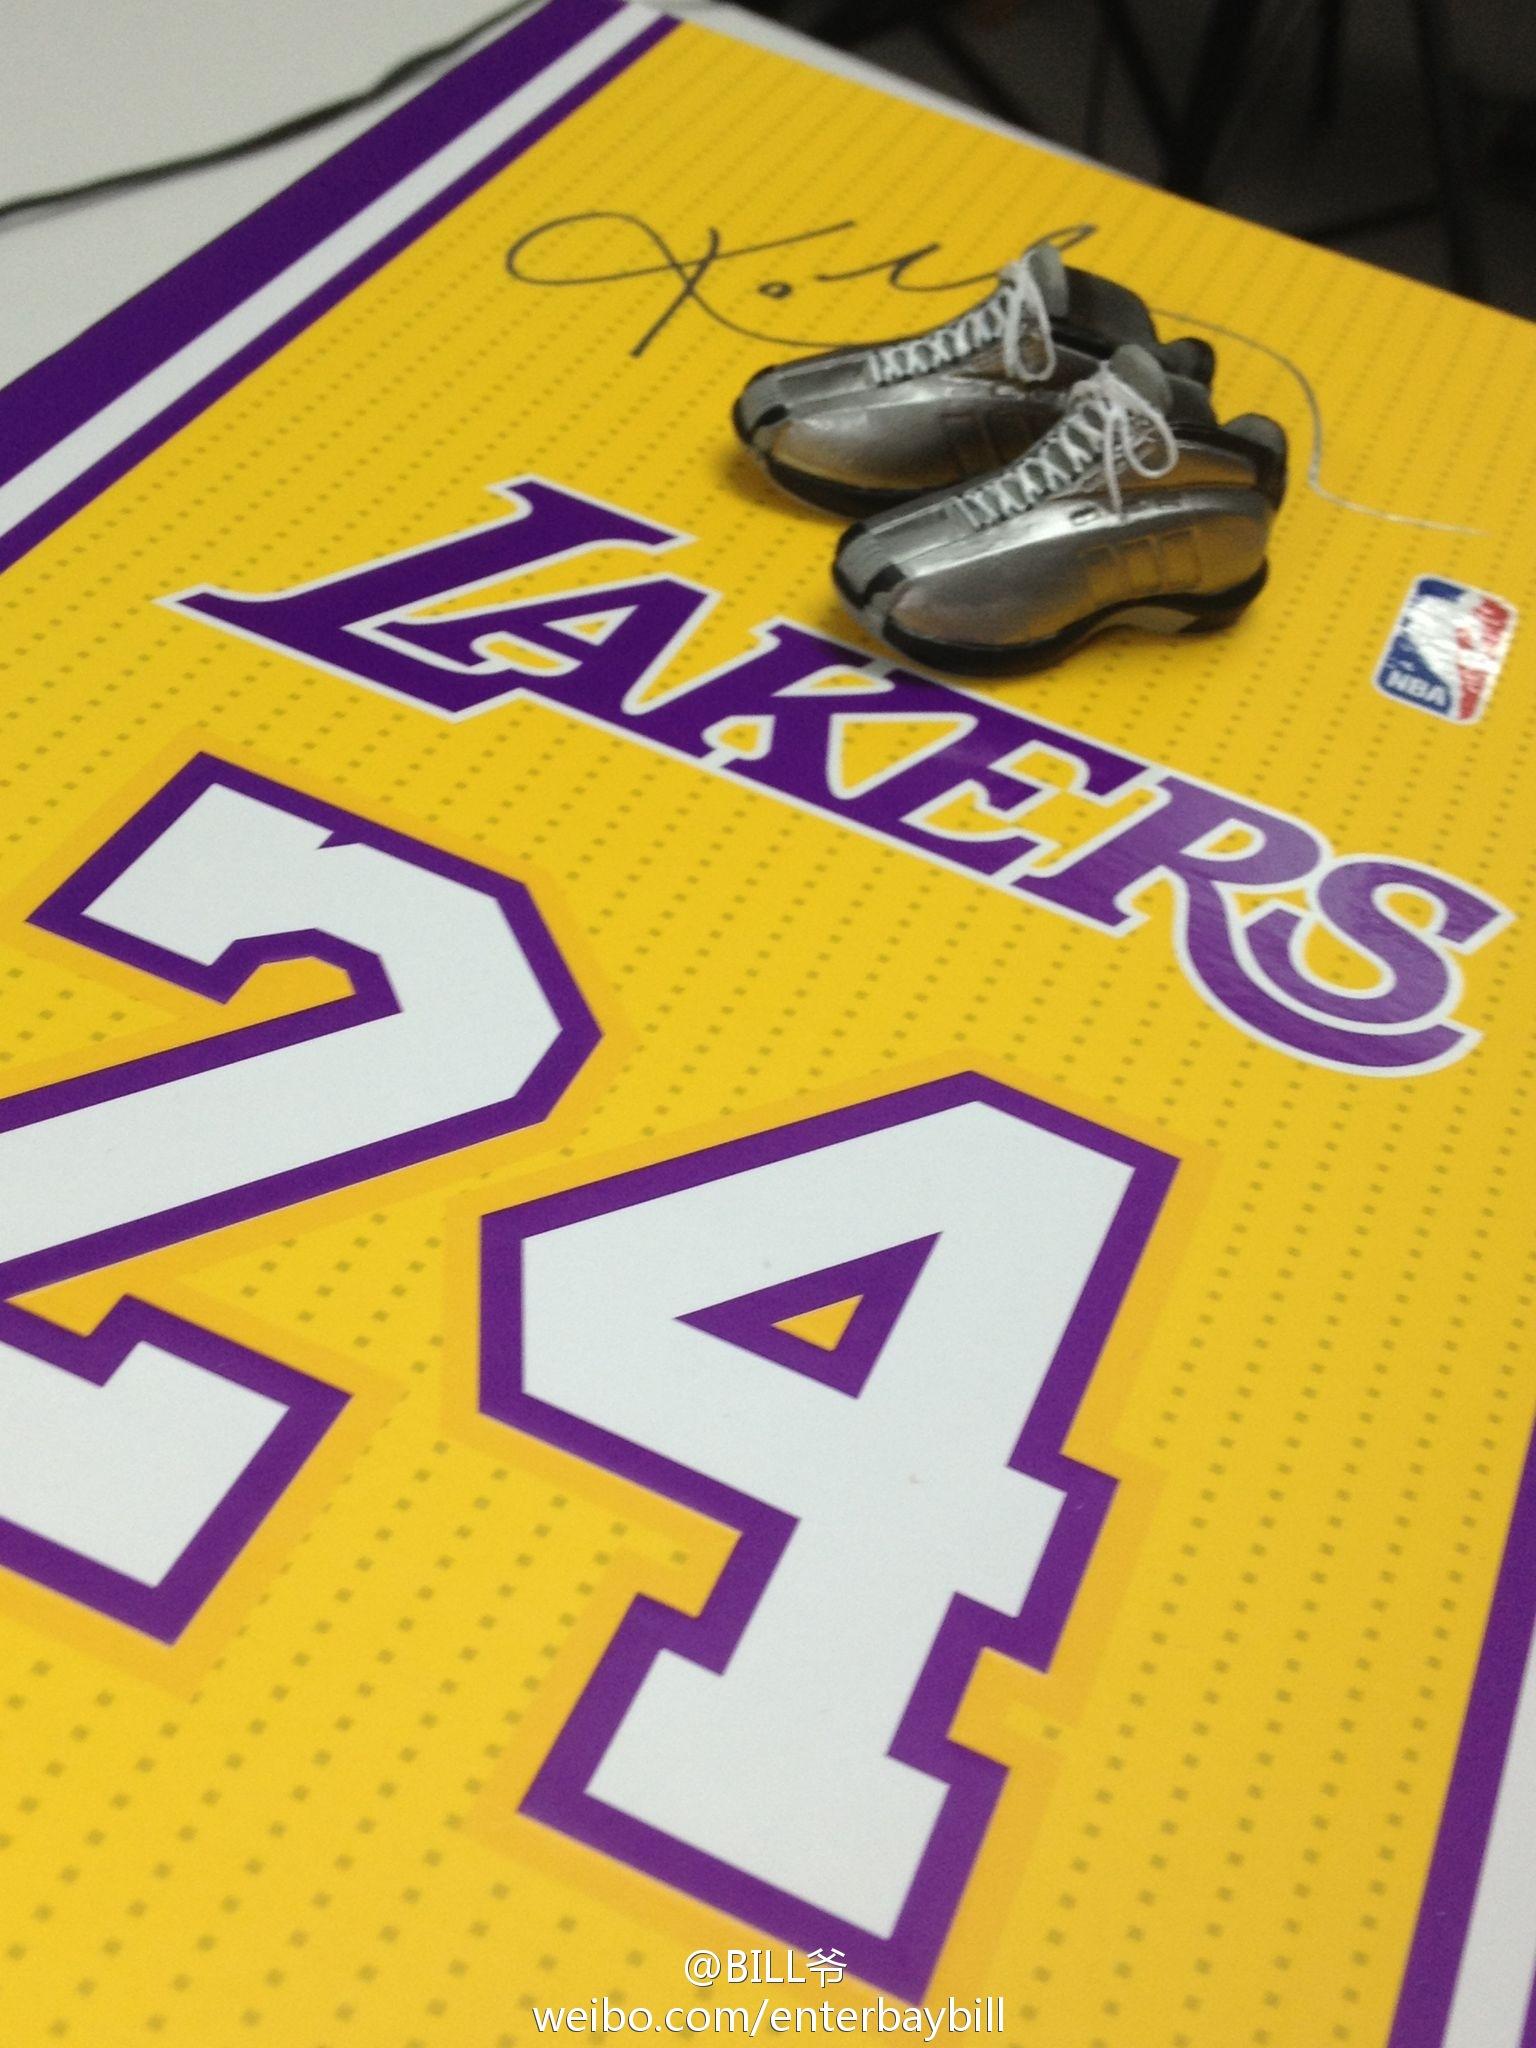 [ENTERBAY] NBA Real Masterpiece - Kobe Bryant!!! - Página 3 69464edejw1dvajh9khm4j